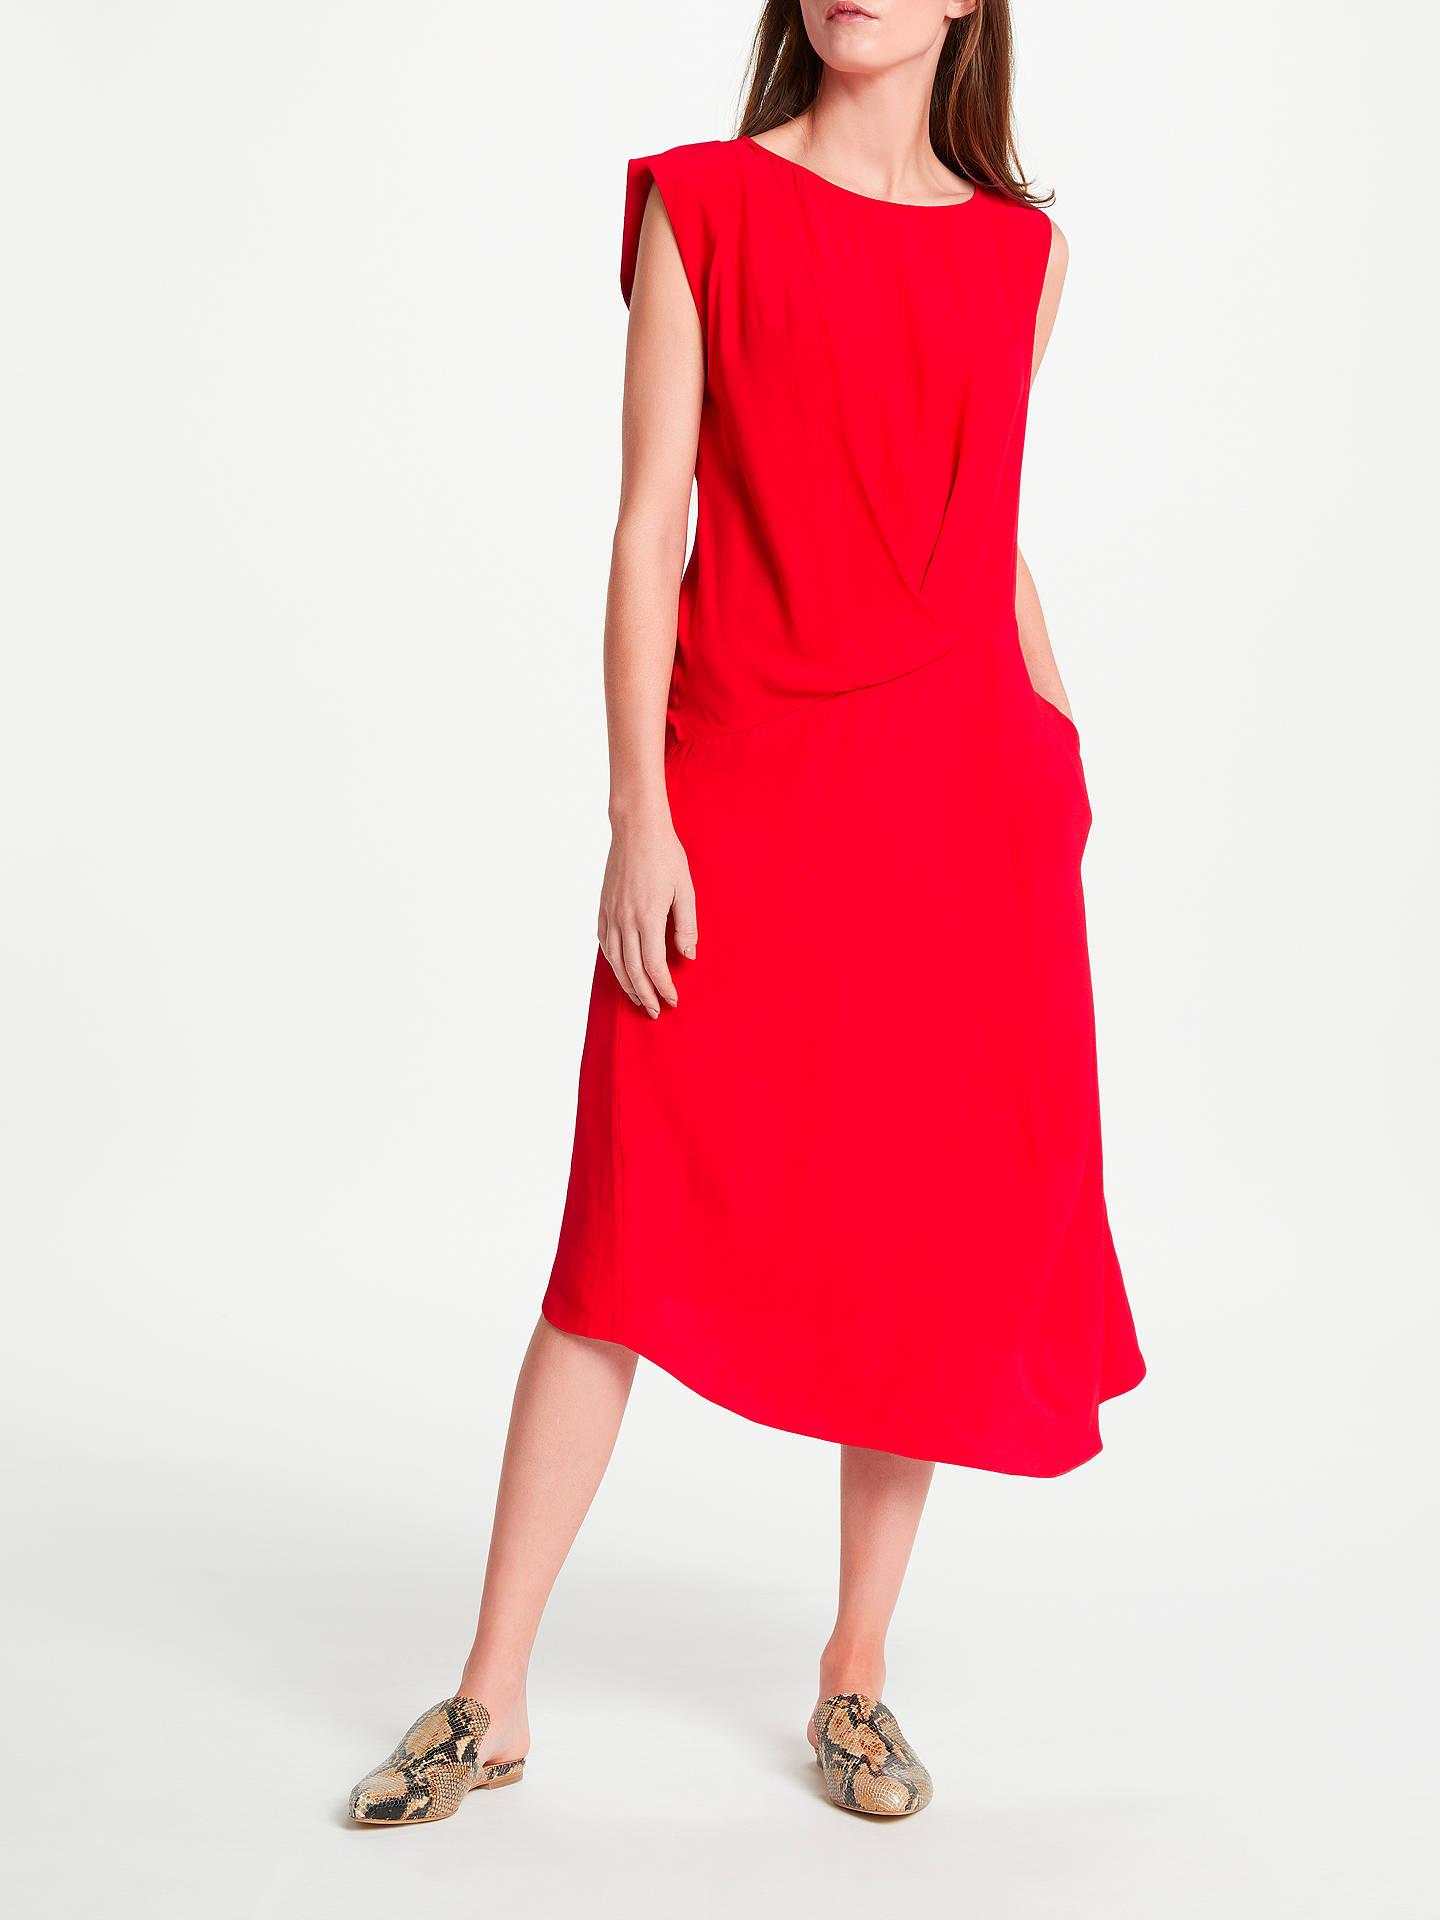 6c0c3802686 Buy Modern Rarity Eudon Choi Surette Drape Dress